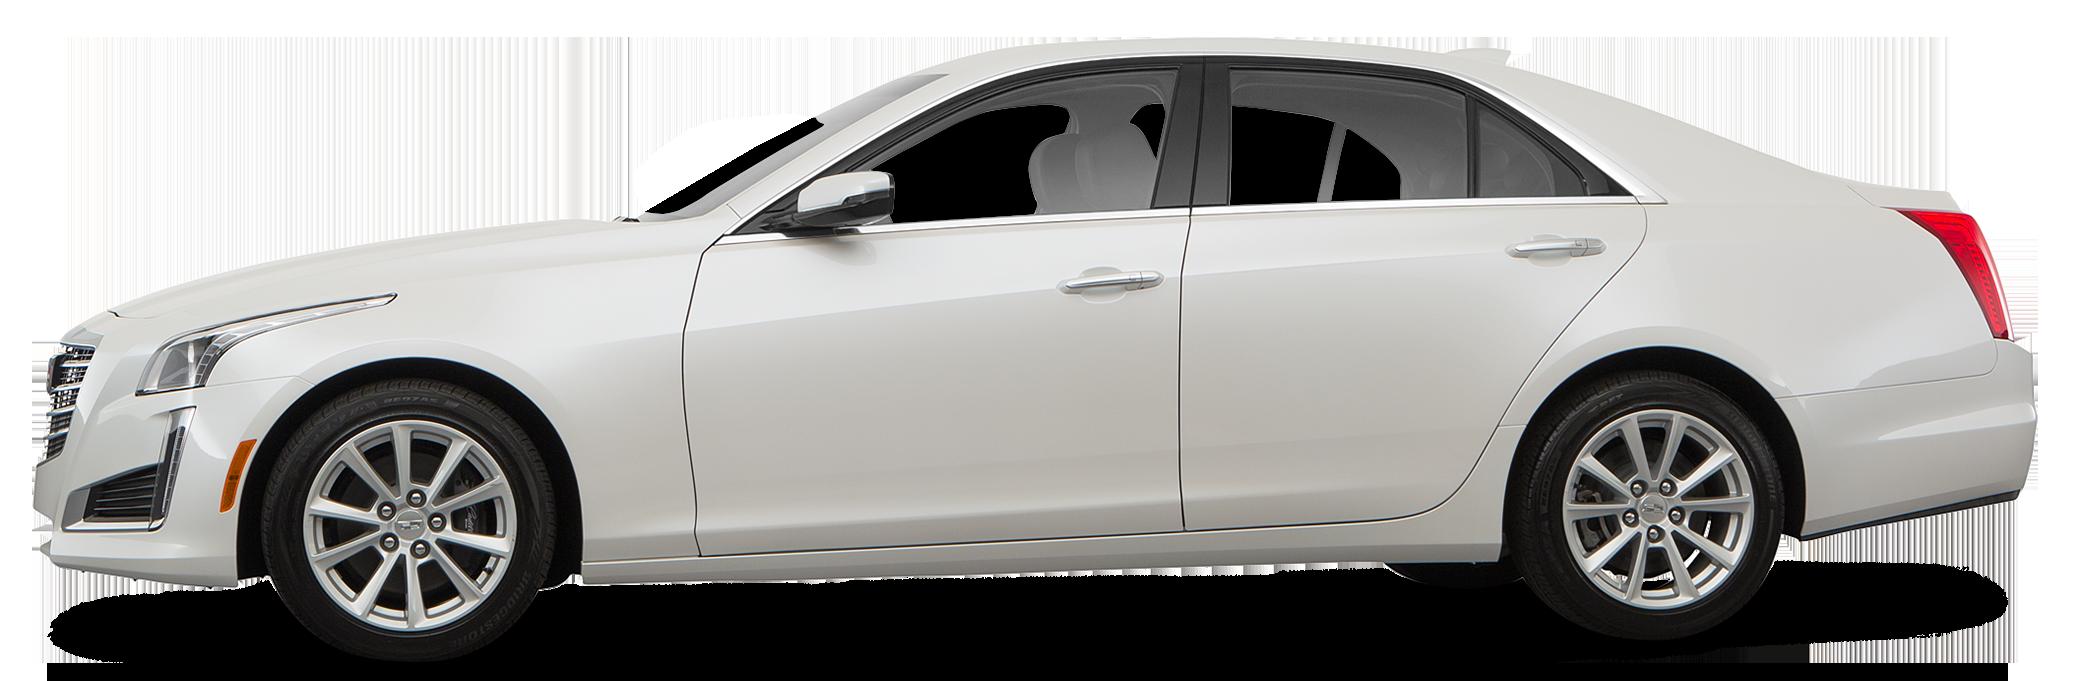 2019 CADILLAC CTS Sedan 2.0L Turbo Base